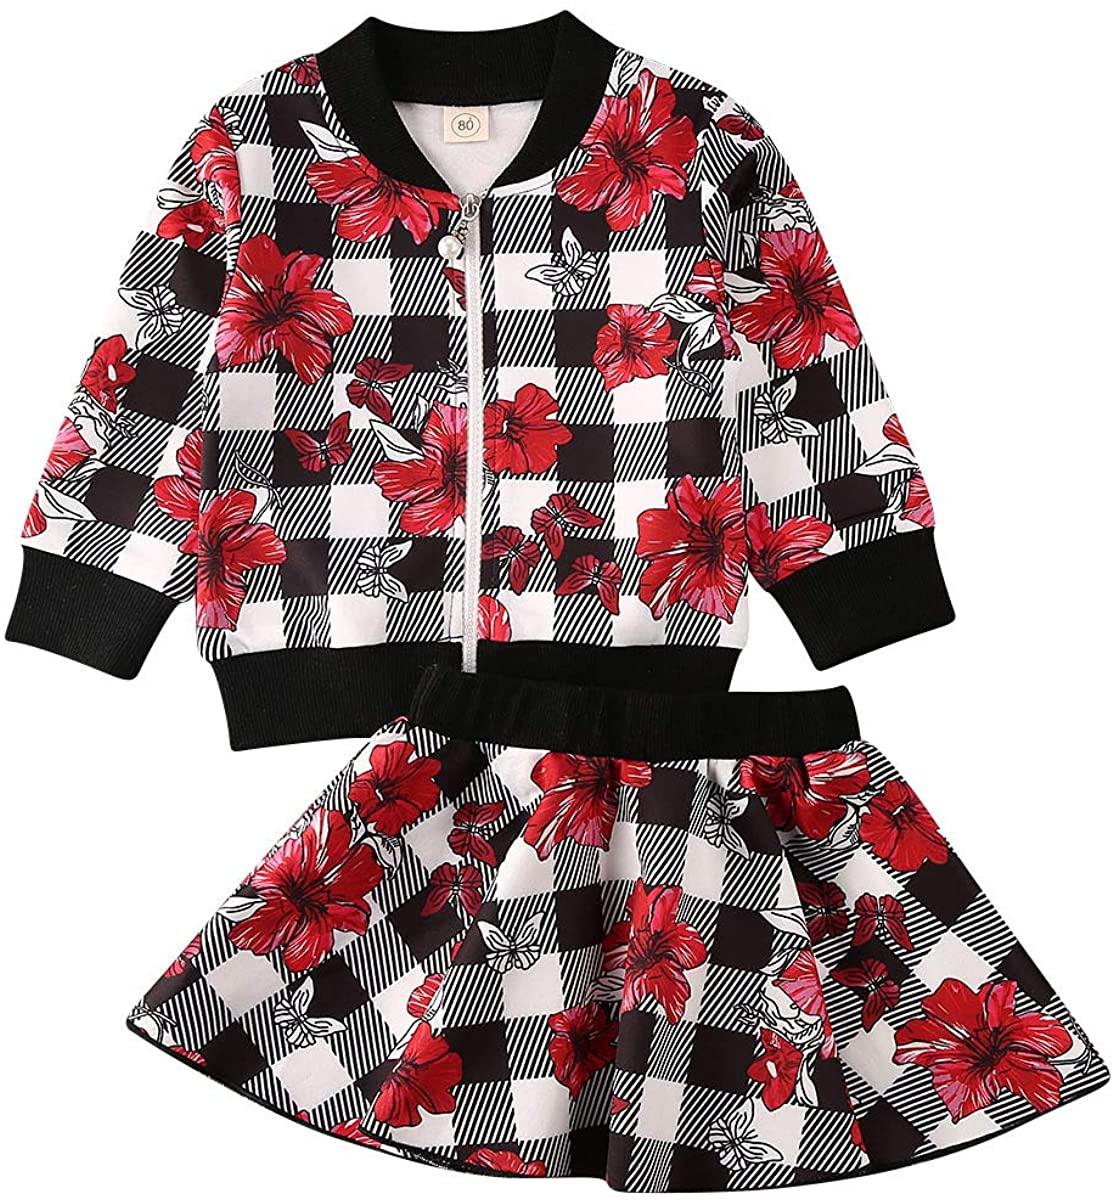 Toddler Kids Baby Girls Plaid Skirt Set Cardigan Jacket Coat + Tutu Knit Dress Set Long Sleeve Fall Winter Outfits Set